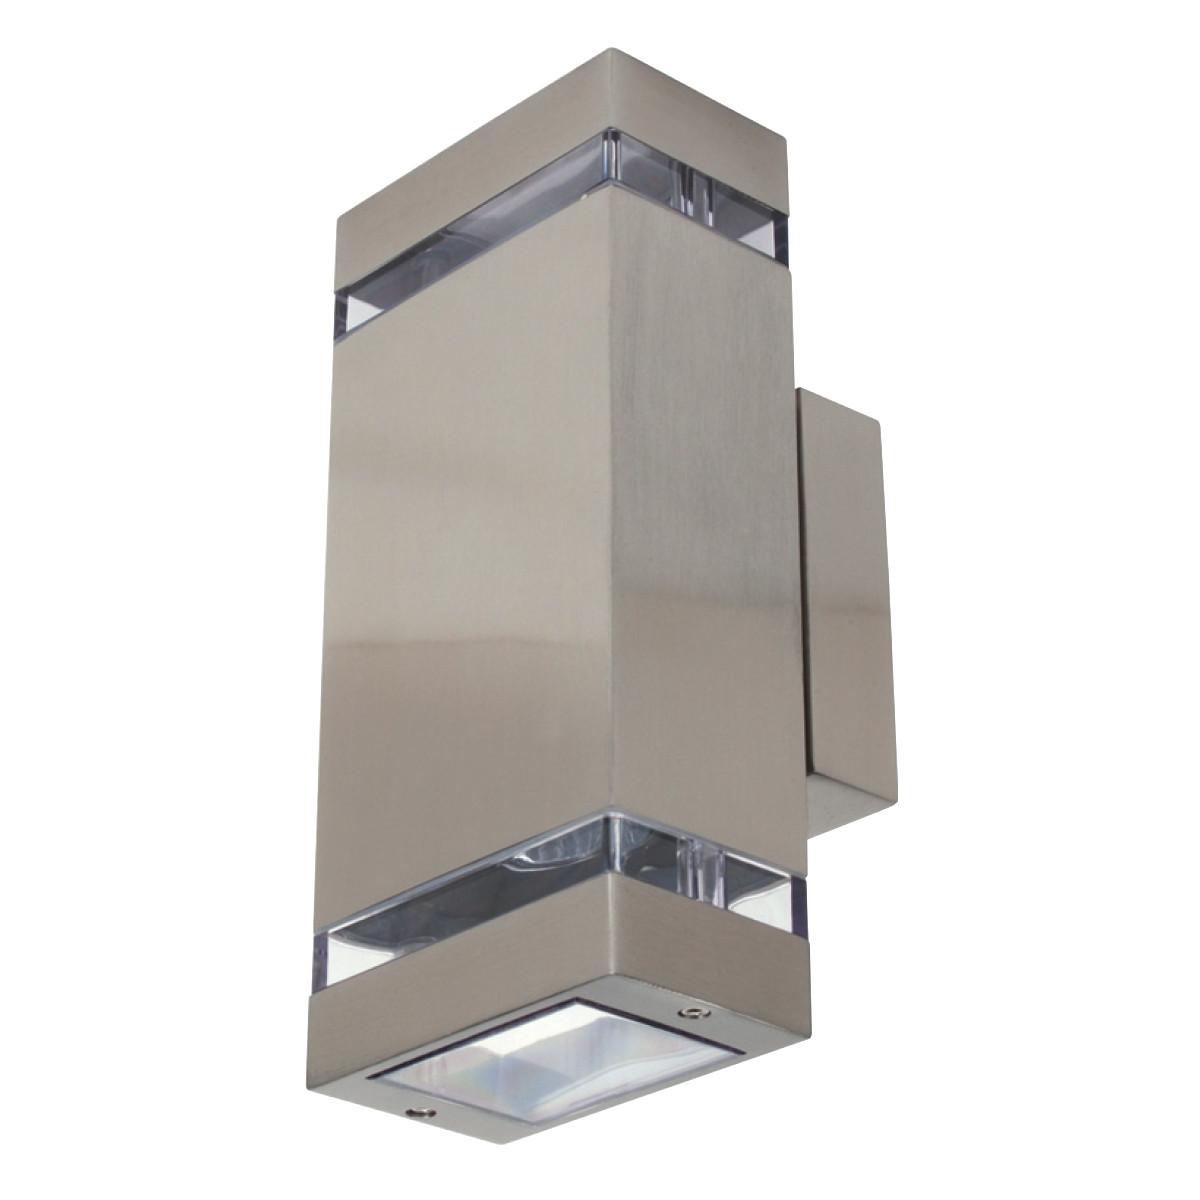 LED Tuinverlichting - Buitenlamp - Gardy 2 - Wand - RVS Mat Chroom - GU10 - Vierkant